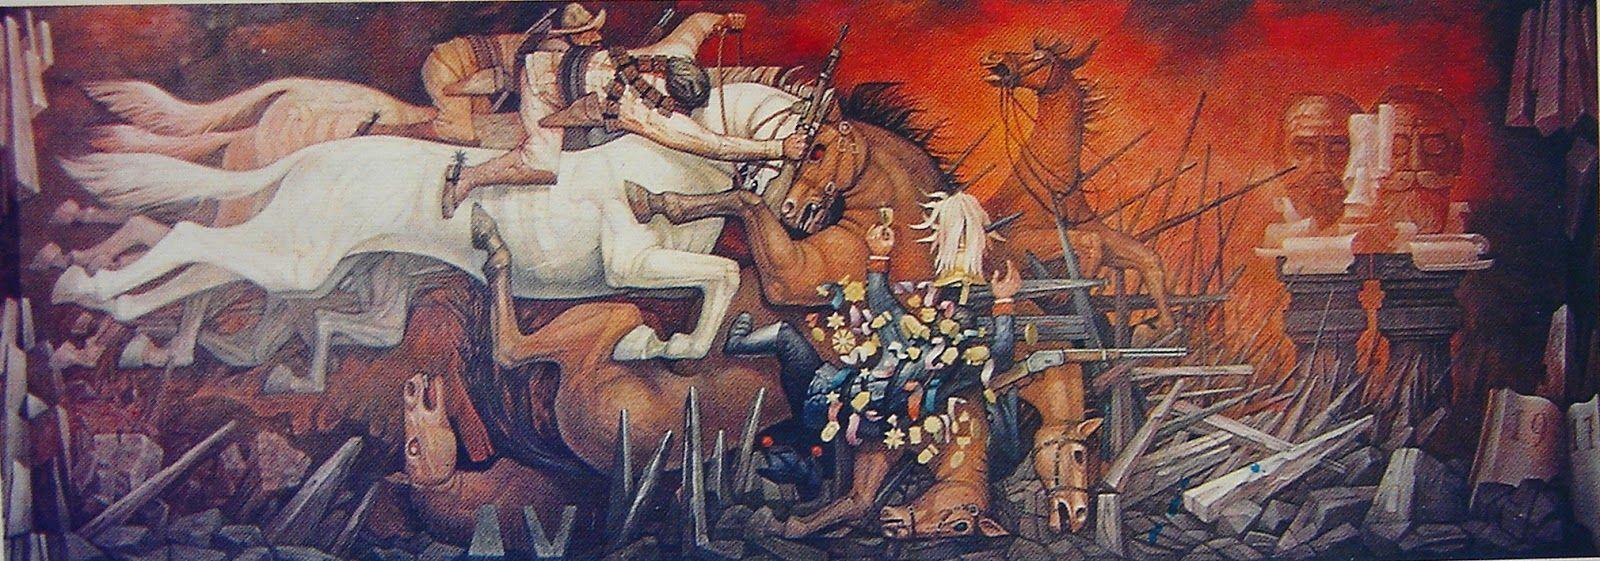 Jorge gonz lez camarena partido del trabajo zacatecas for Arte mural mexicano